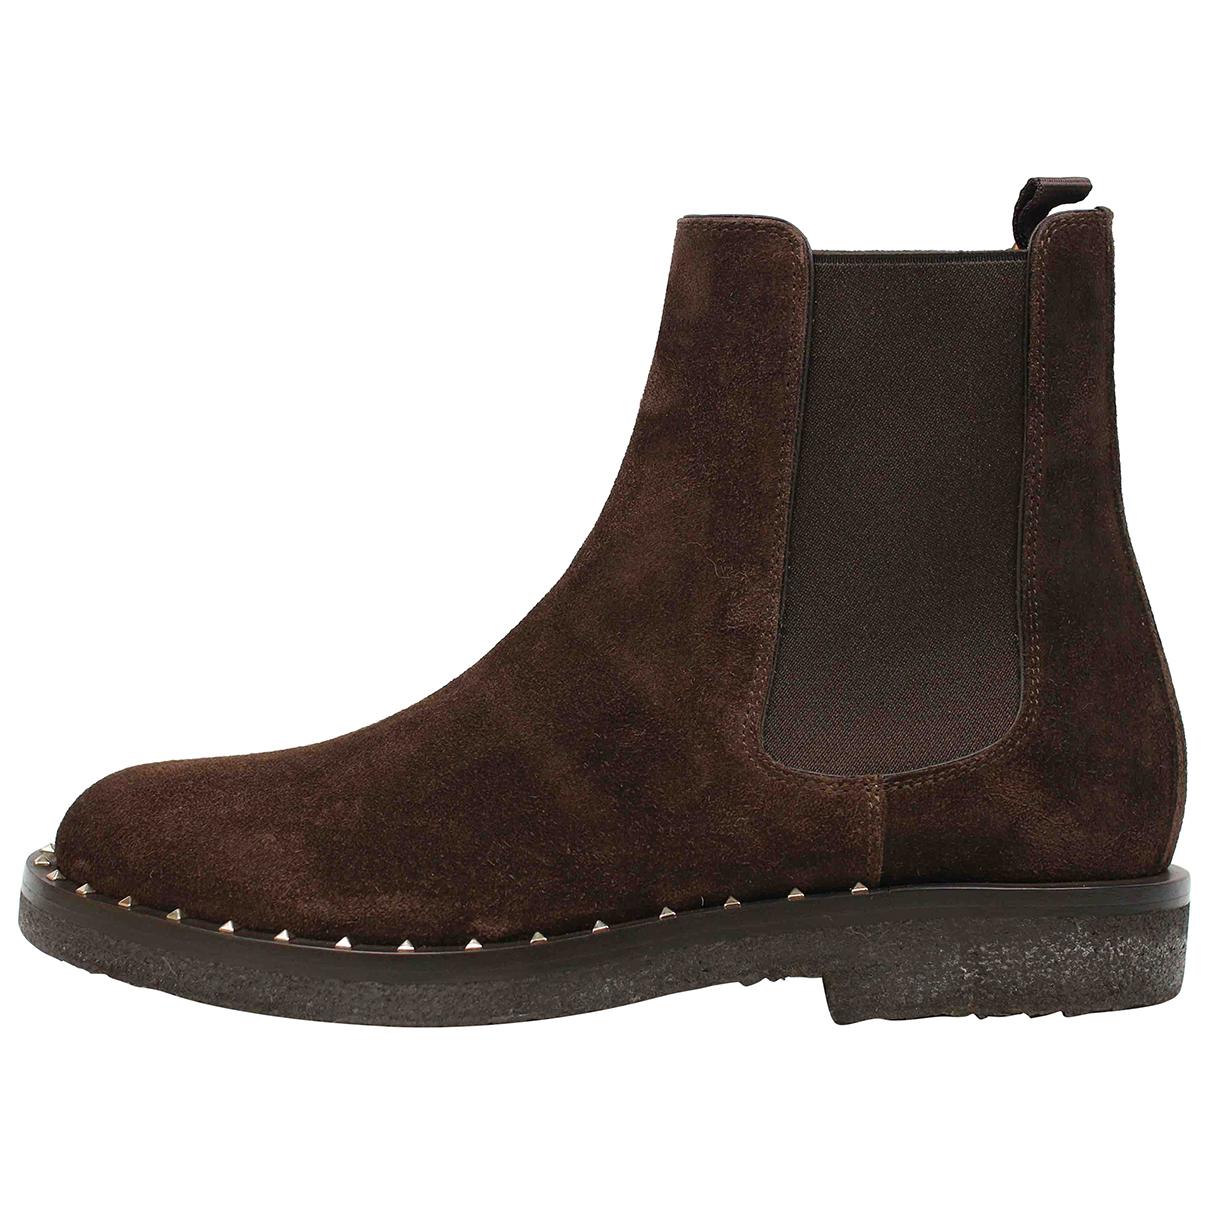 Valentino Garavani N Brown Suede Boots for Men 42 EU